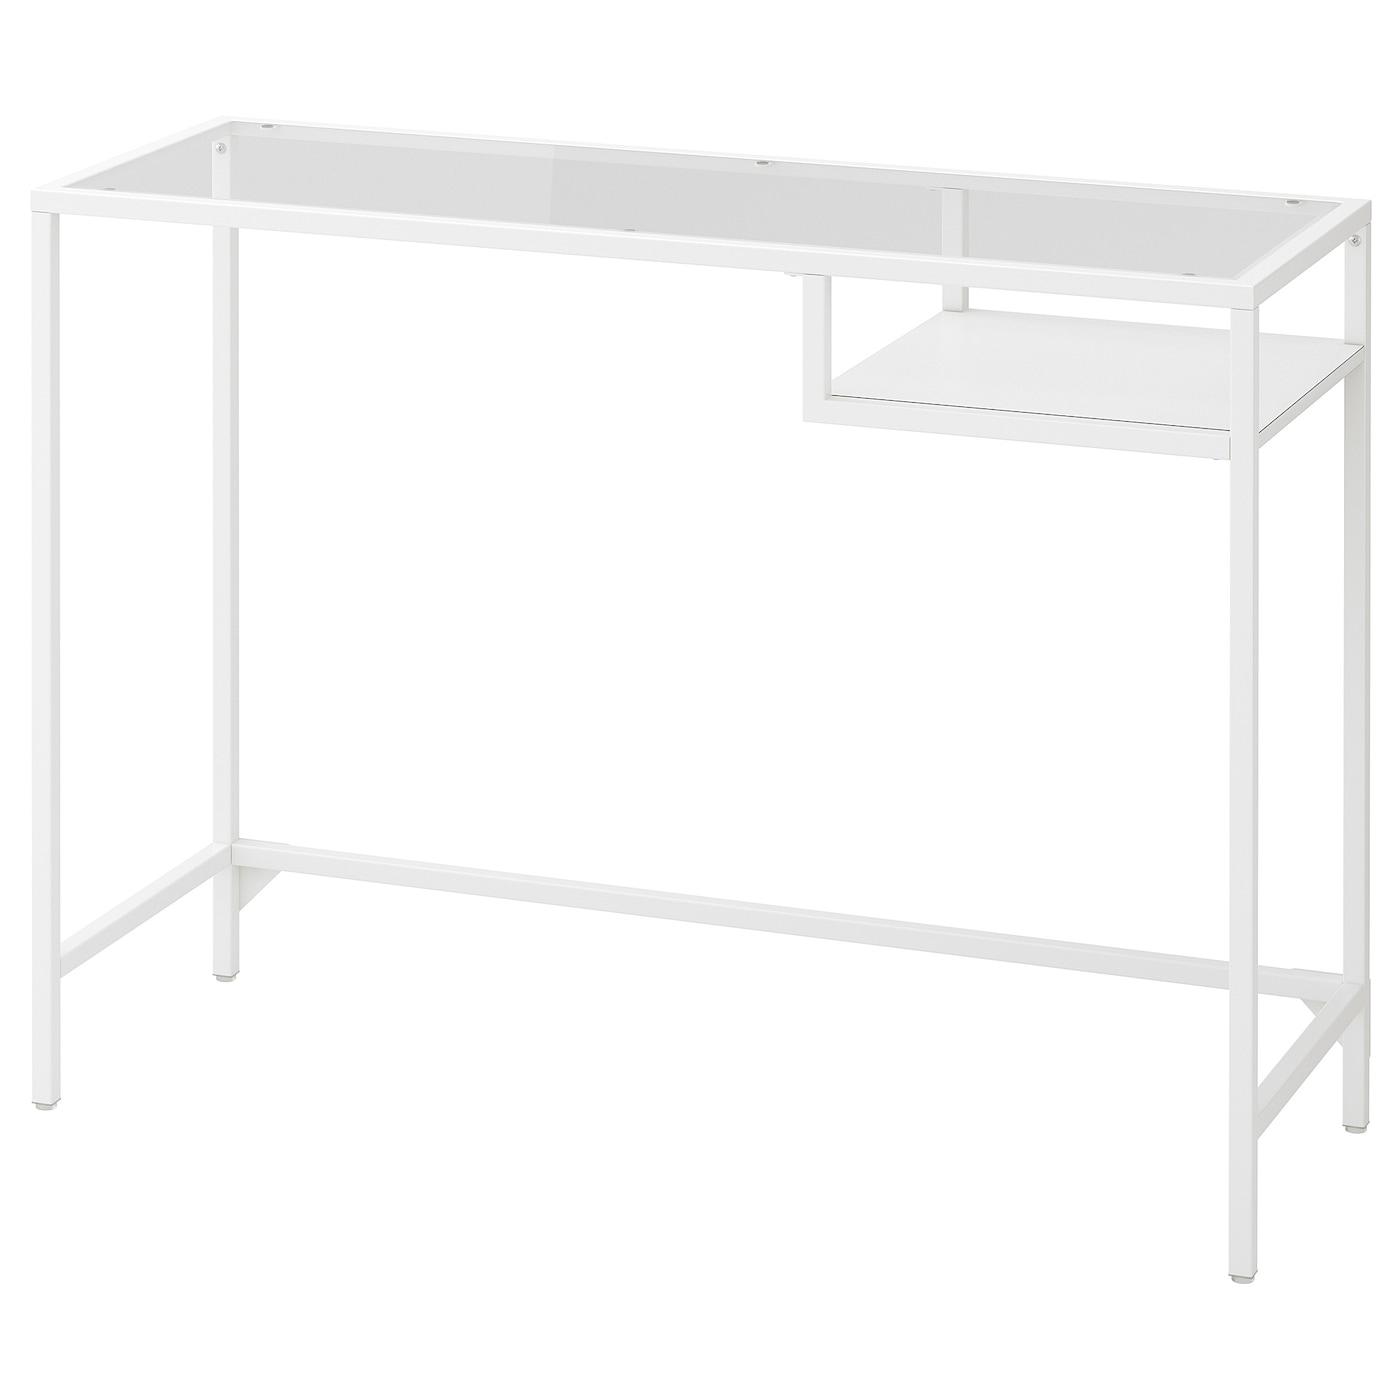 VITTSJÖ Laptopbord, svartbrun, glas, 100x36 cm IKEA